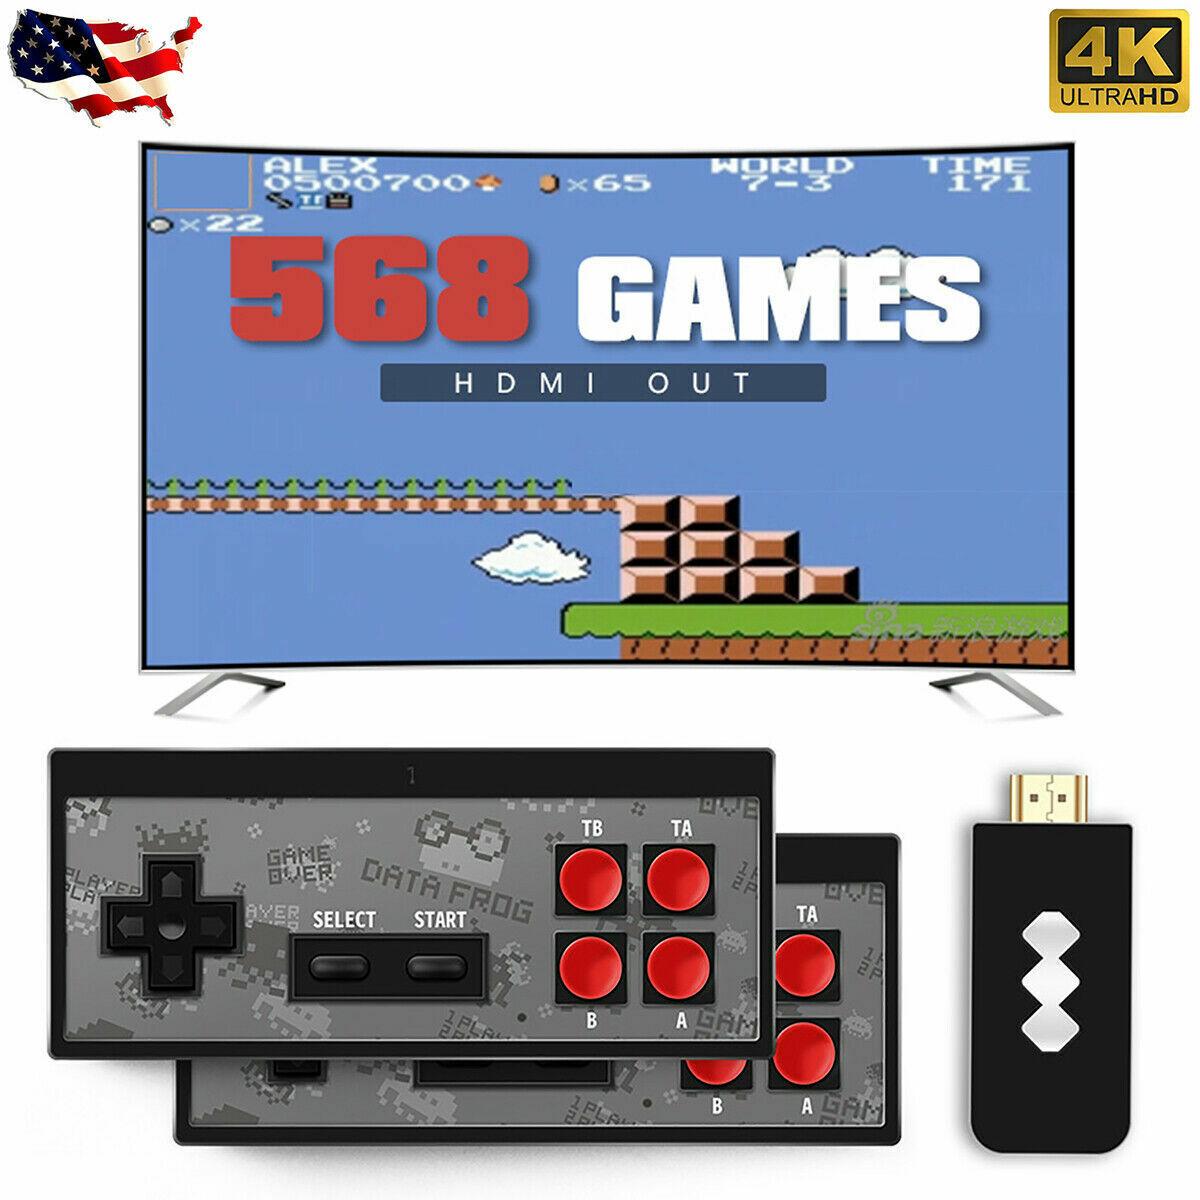 Retro Mini HDMI 4K TV Game Stick Console 568 Built-in Games 2× Wireless Gamepad